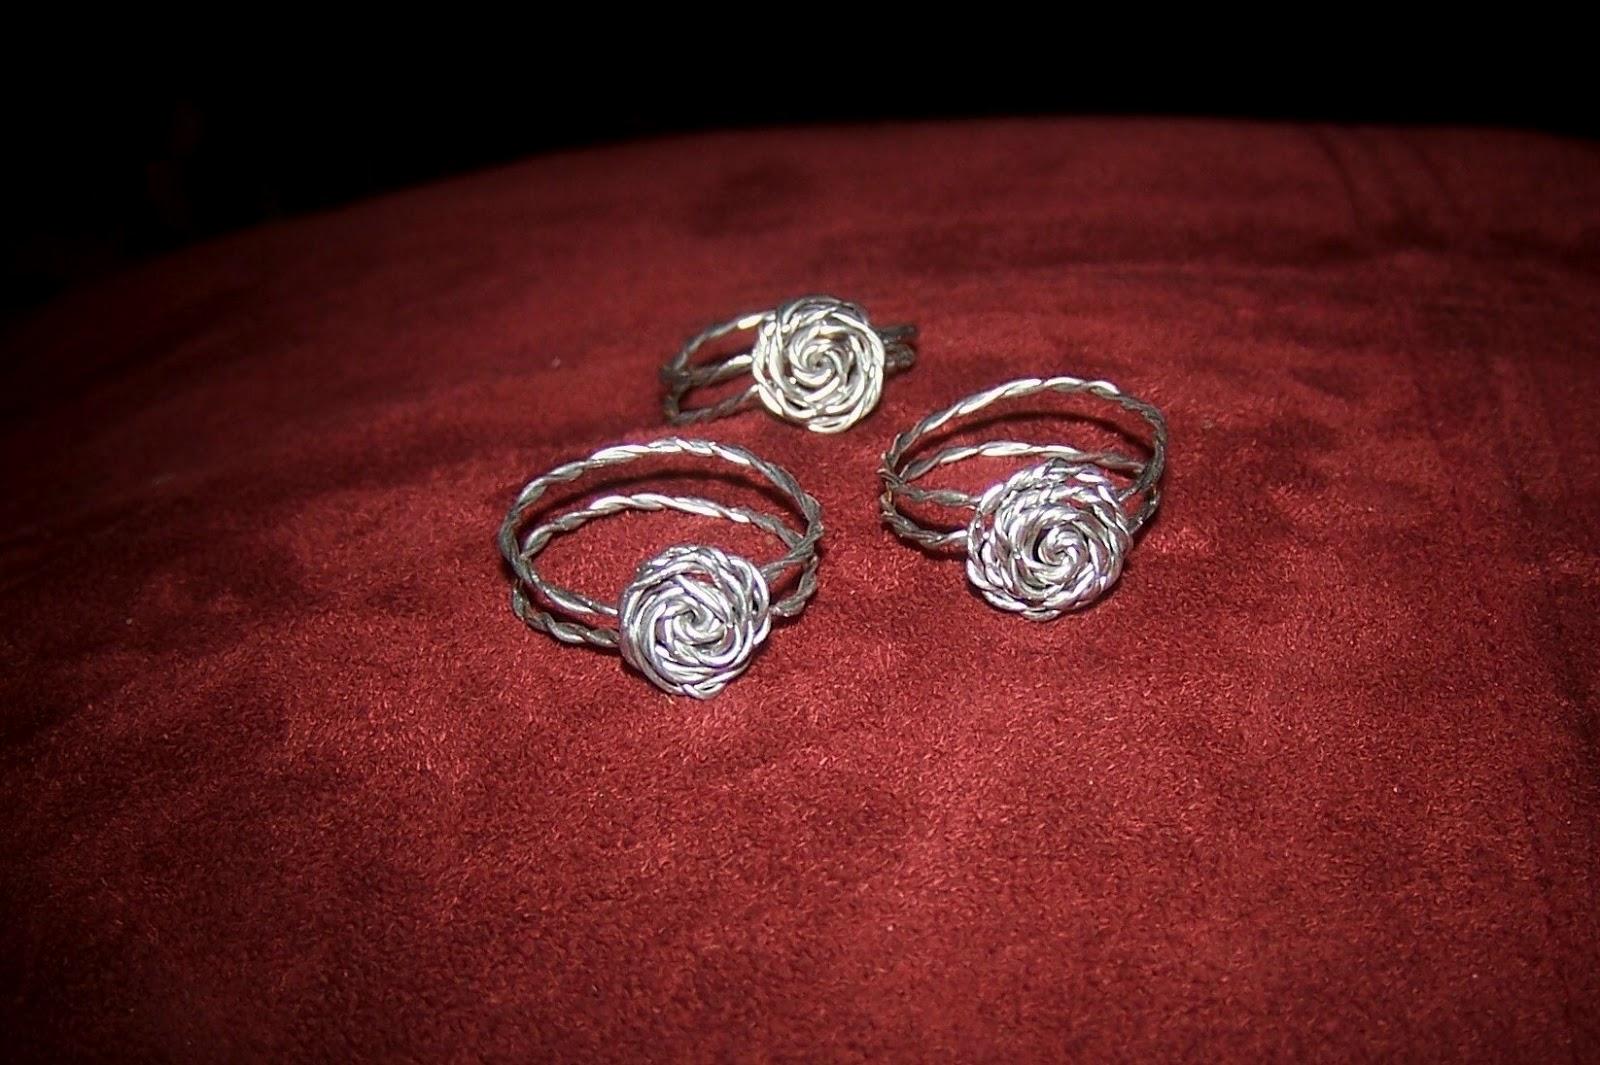 BUG A BOO CORNER: DIY Rose Wire Rings